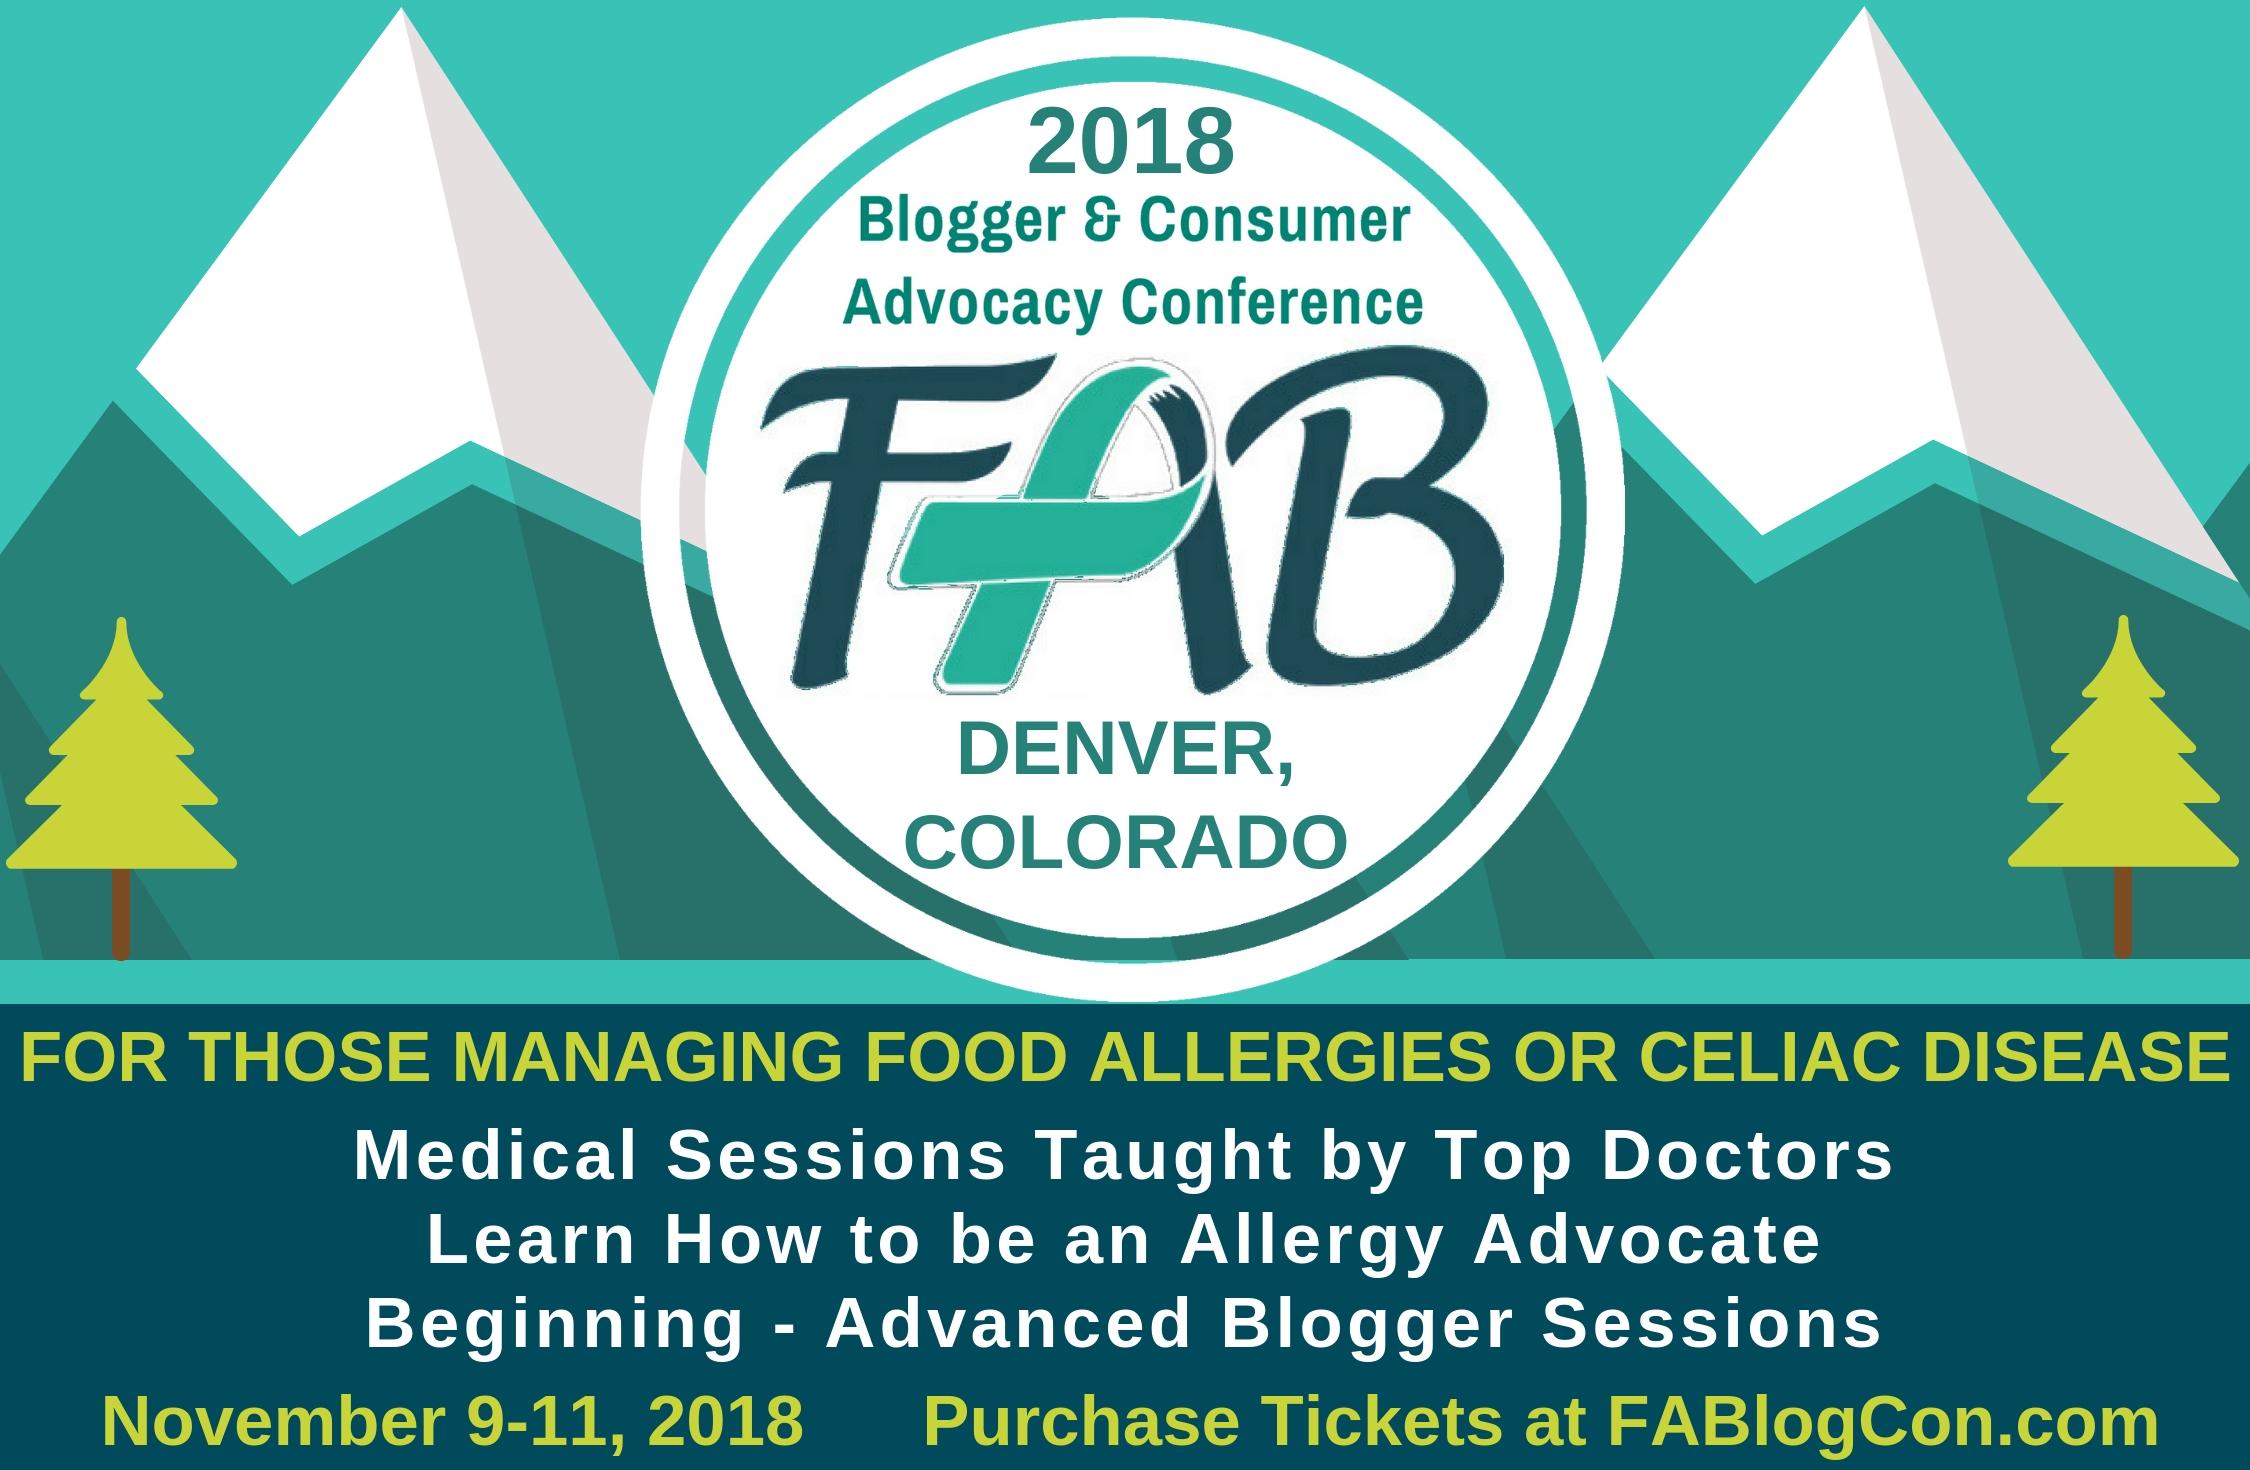 FABlogCon 2018